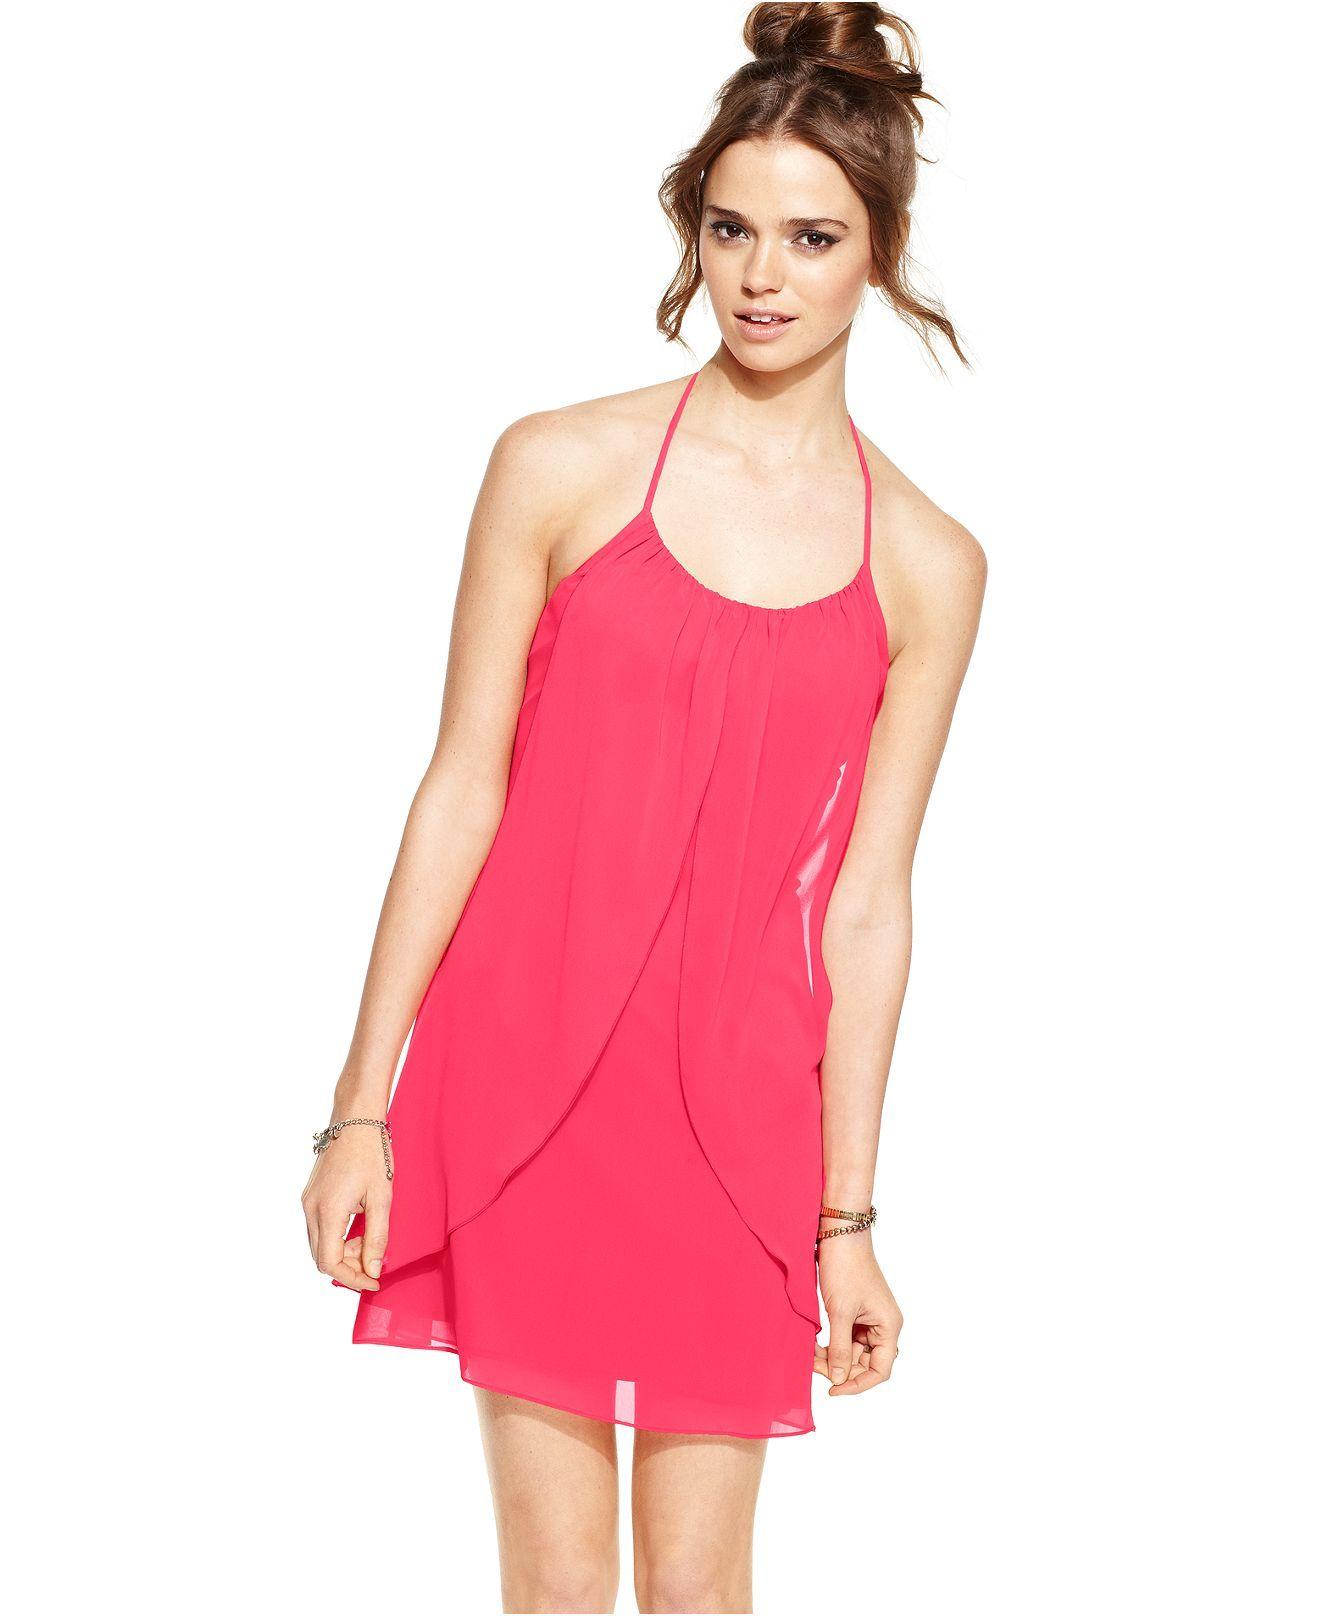 91943e7877e Hailey Logan Juniors Dress